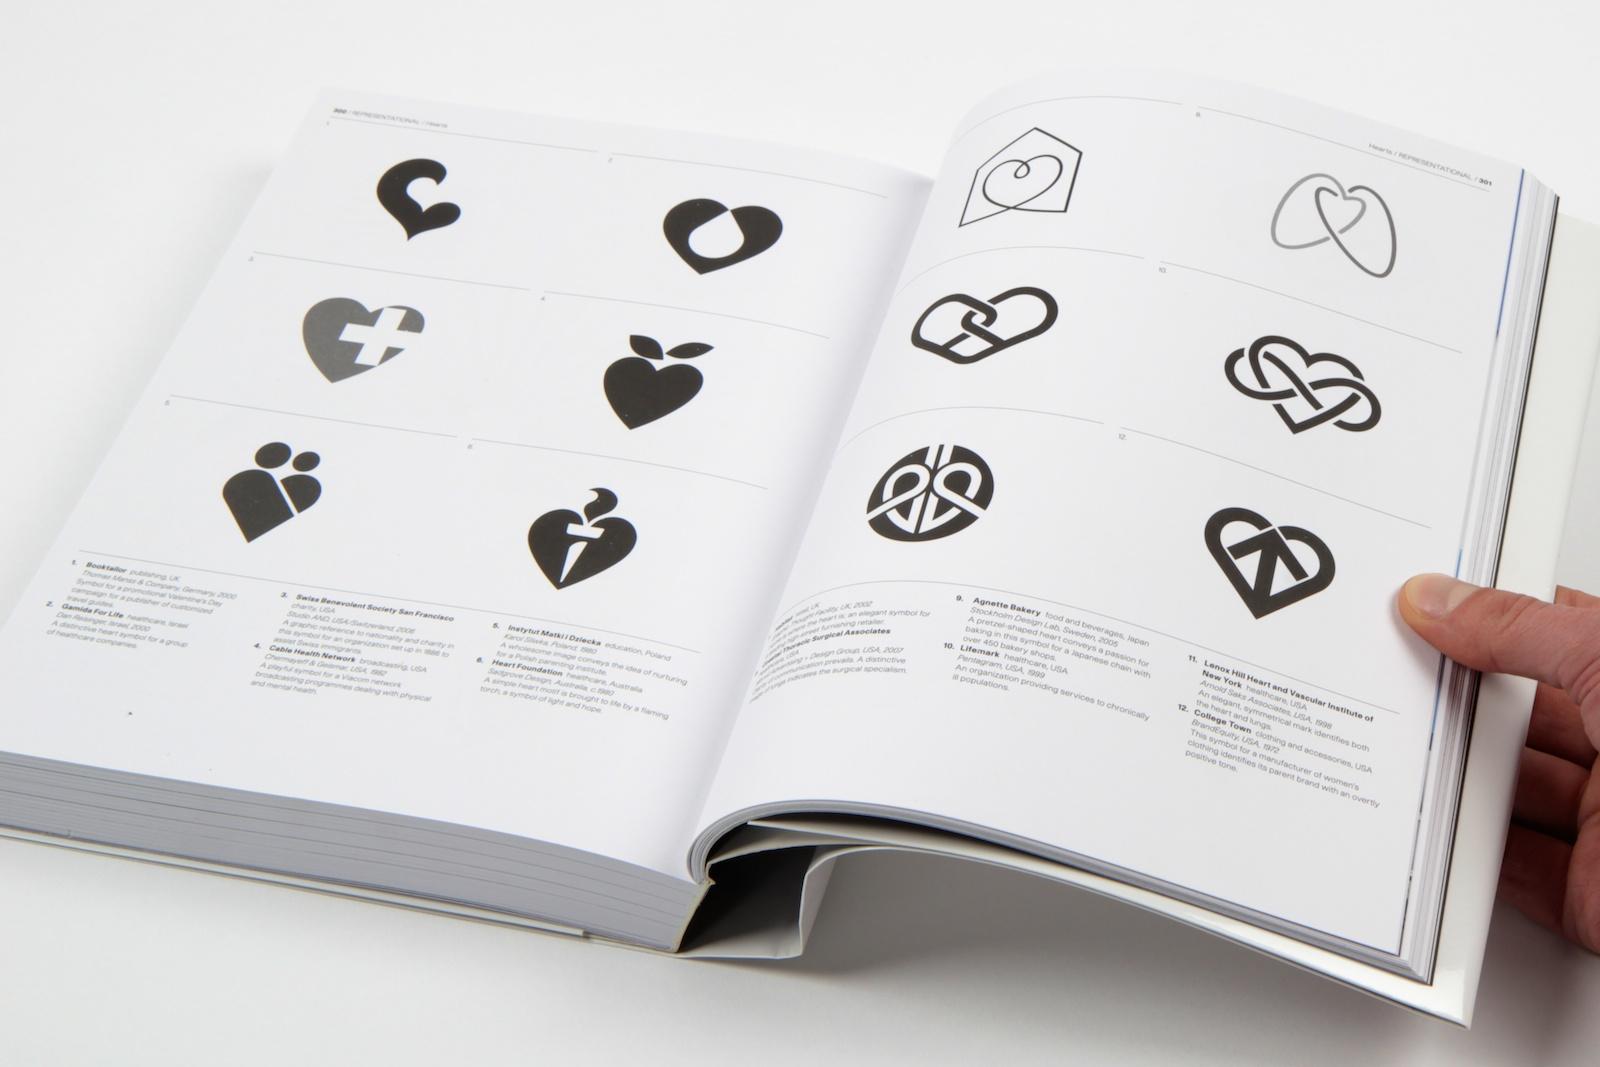 Spread from 'Symbol' book